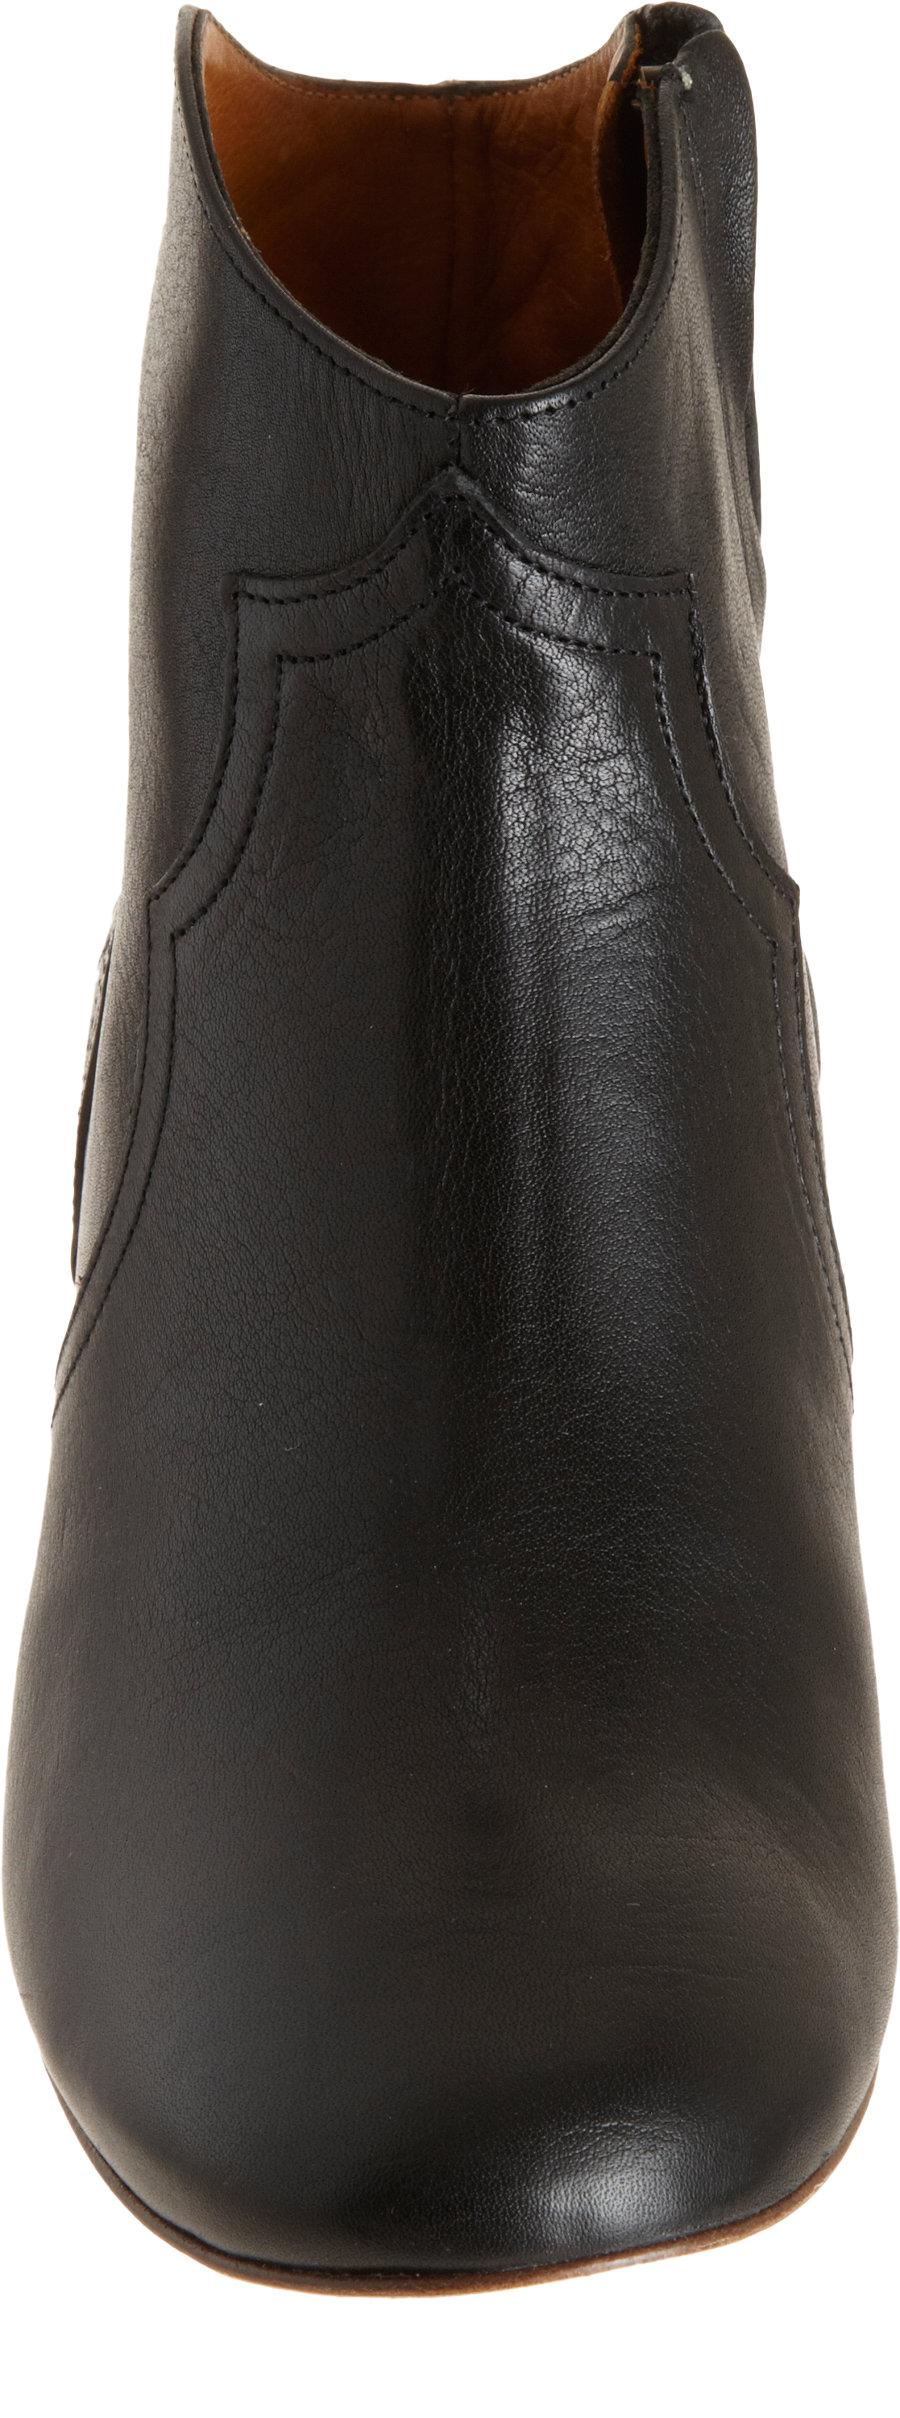 isabel marant dicker ankle boots in black lyst. Black Bedroom Furniture Sets. Home Design Ideas